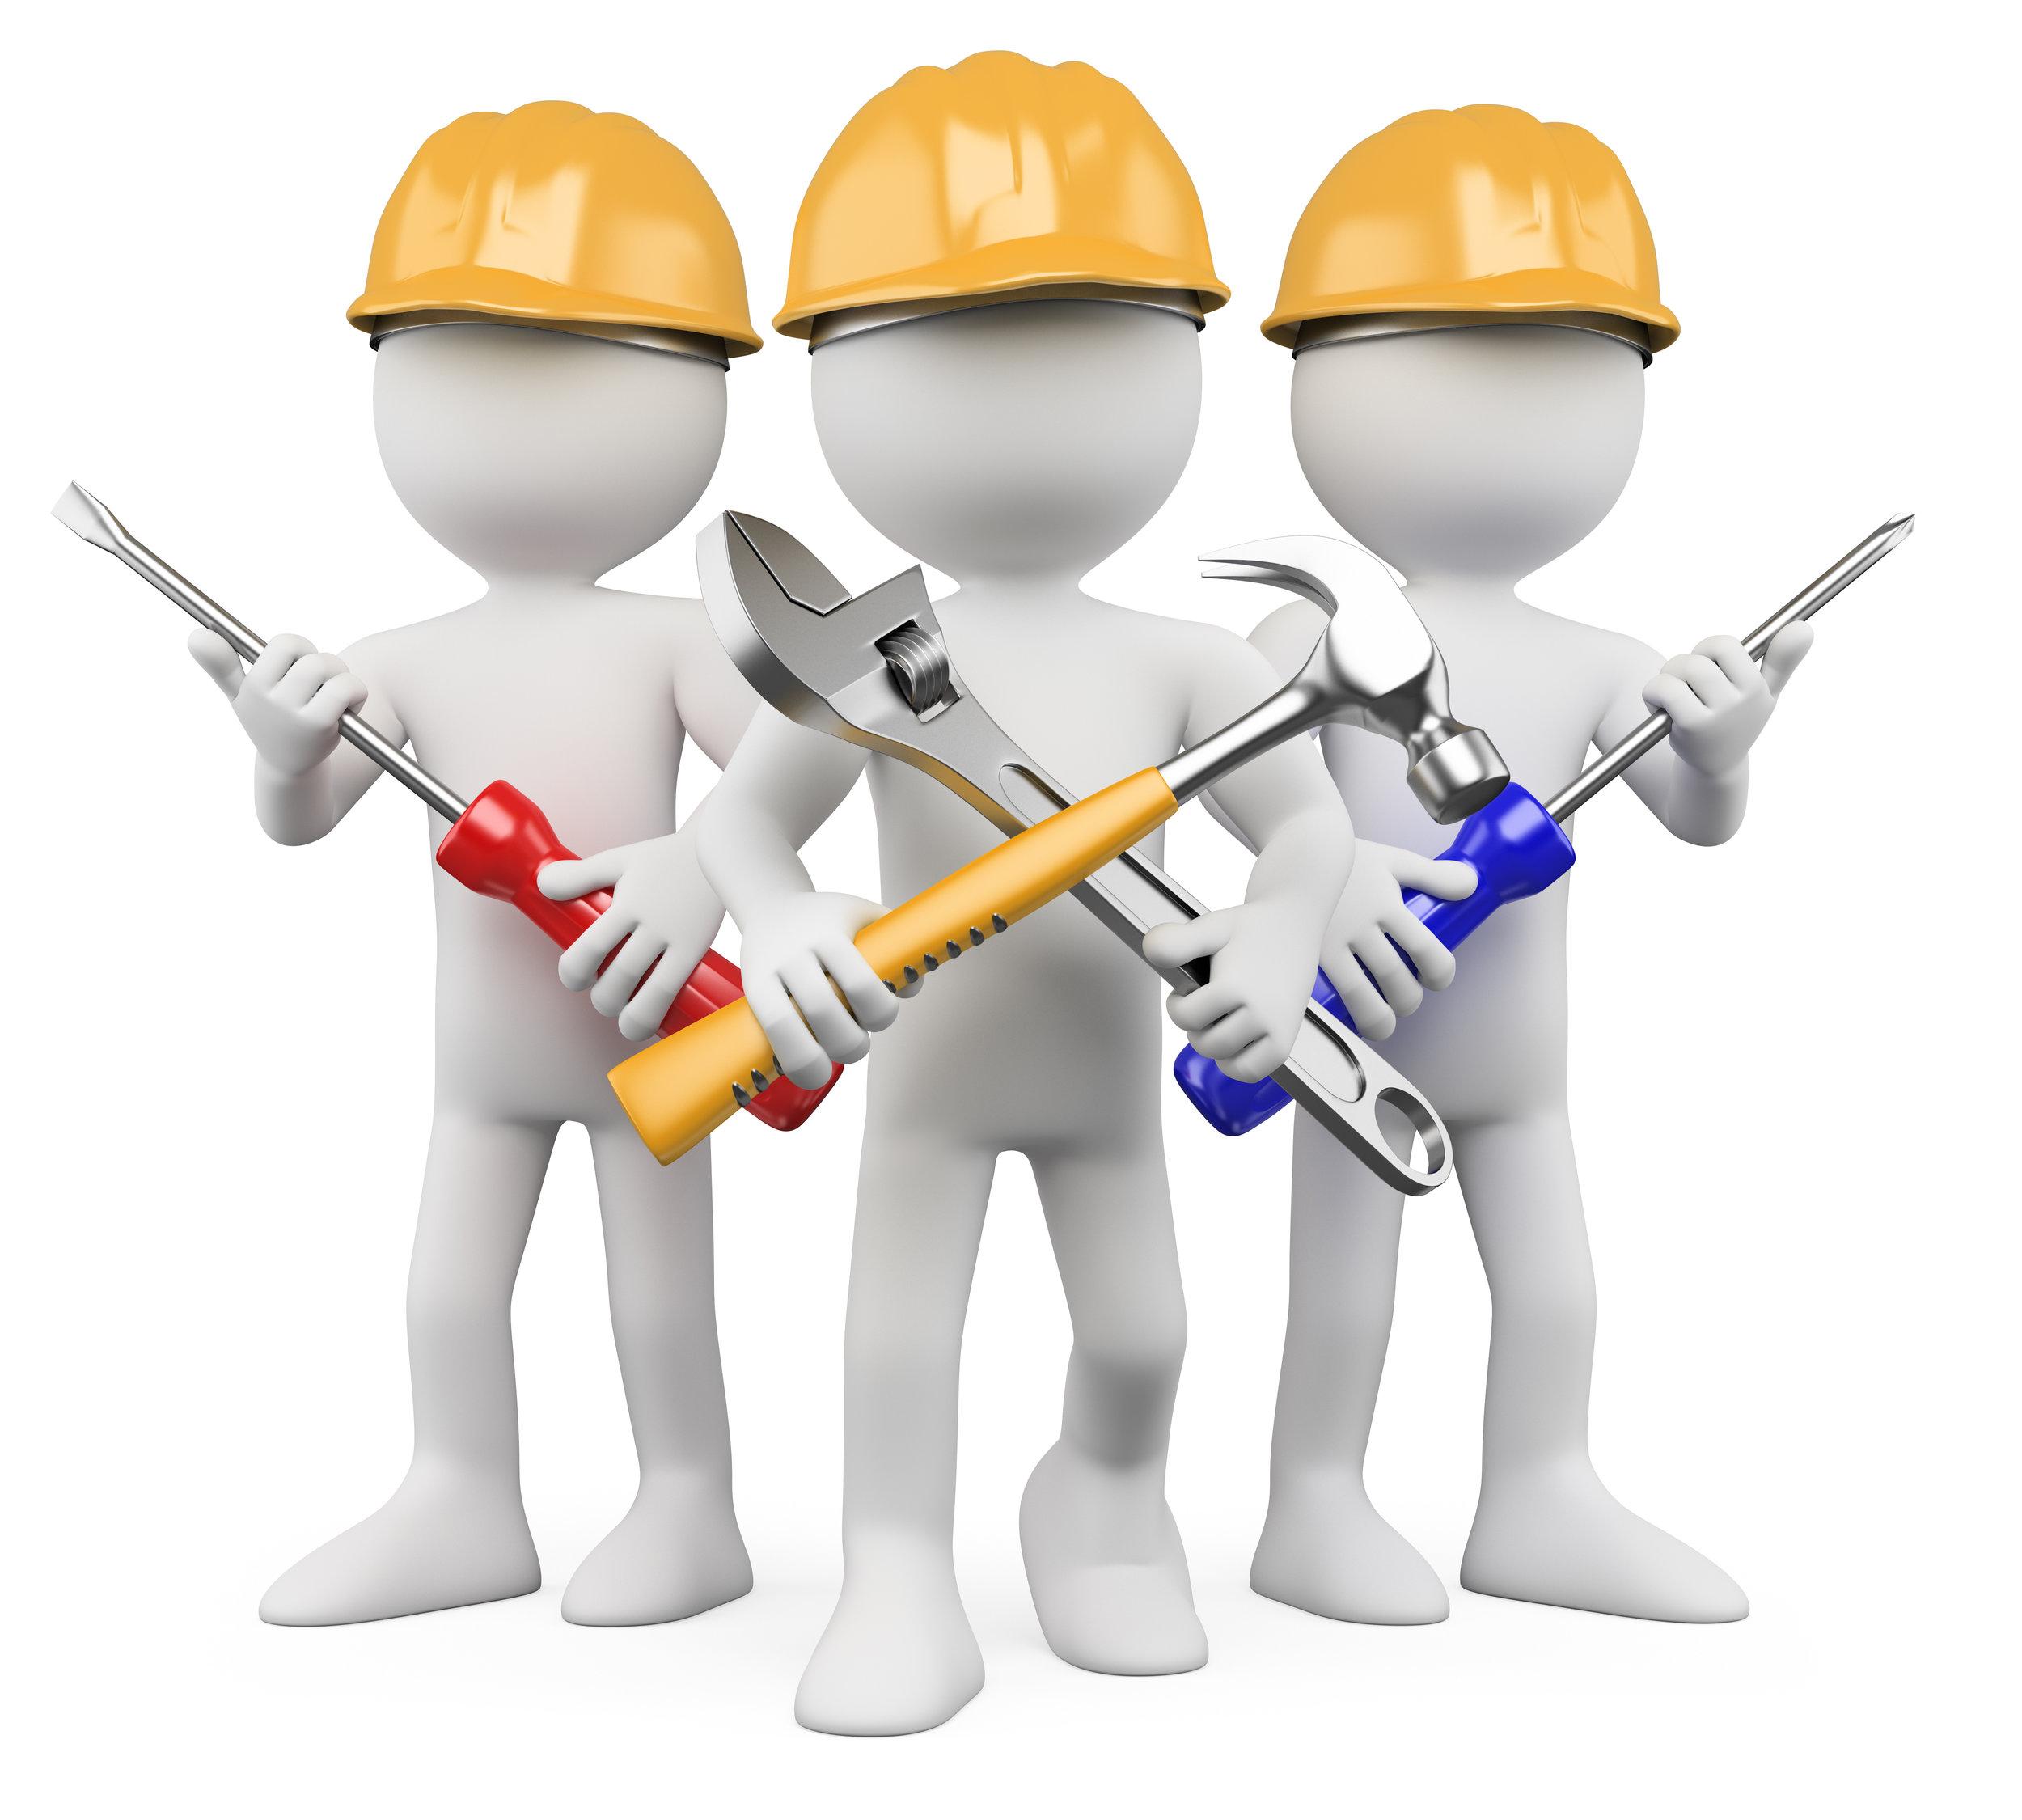 Facility clip art library. Contractor clipart maintenance